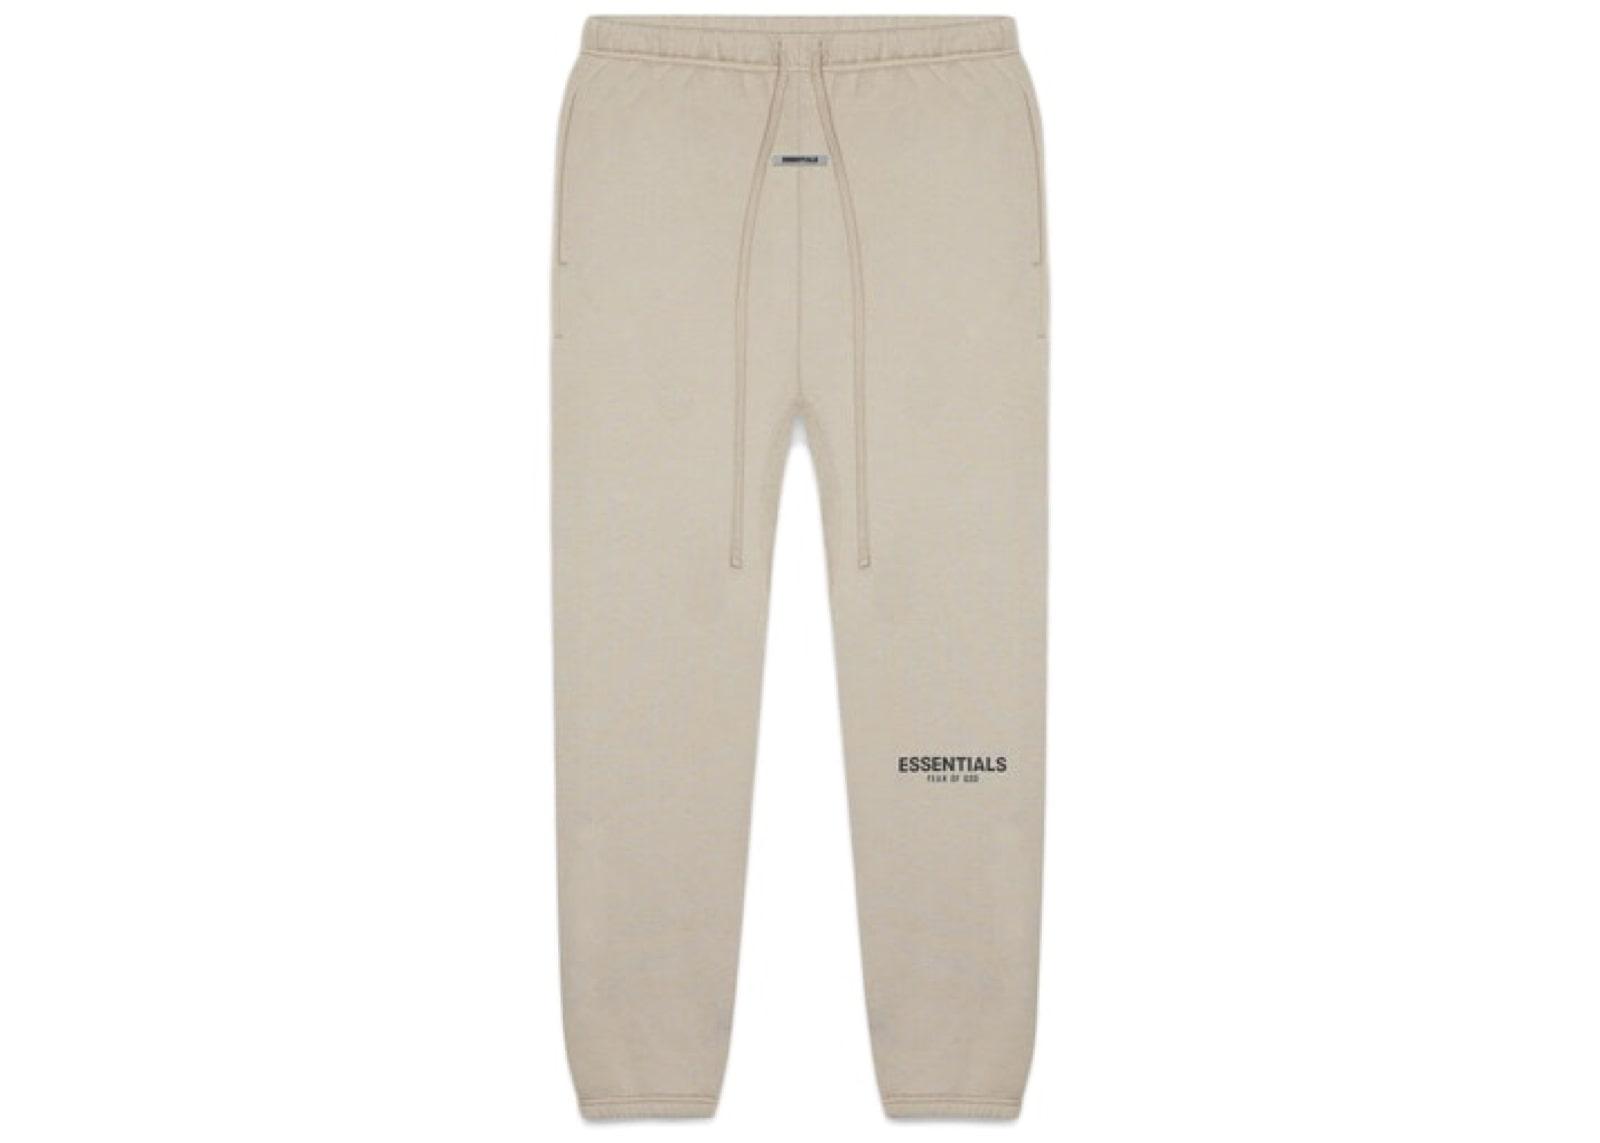 slide 1 - Olive/Khaki Sweatpants